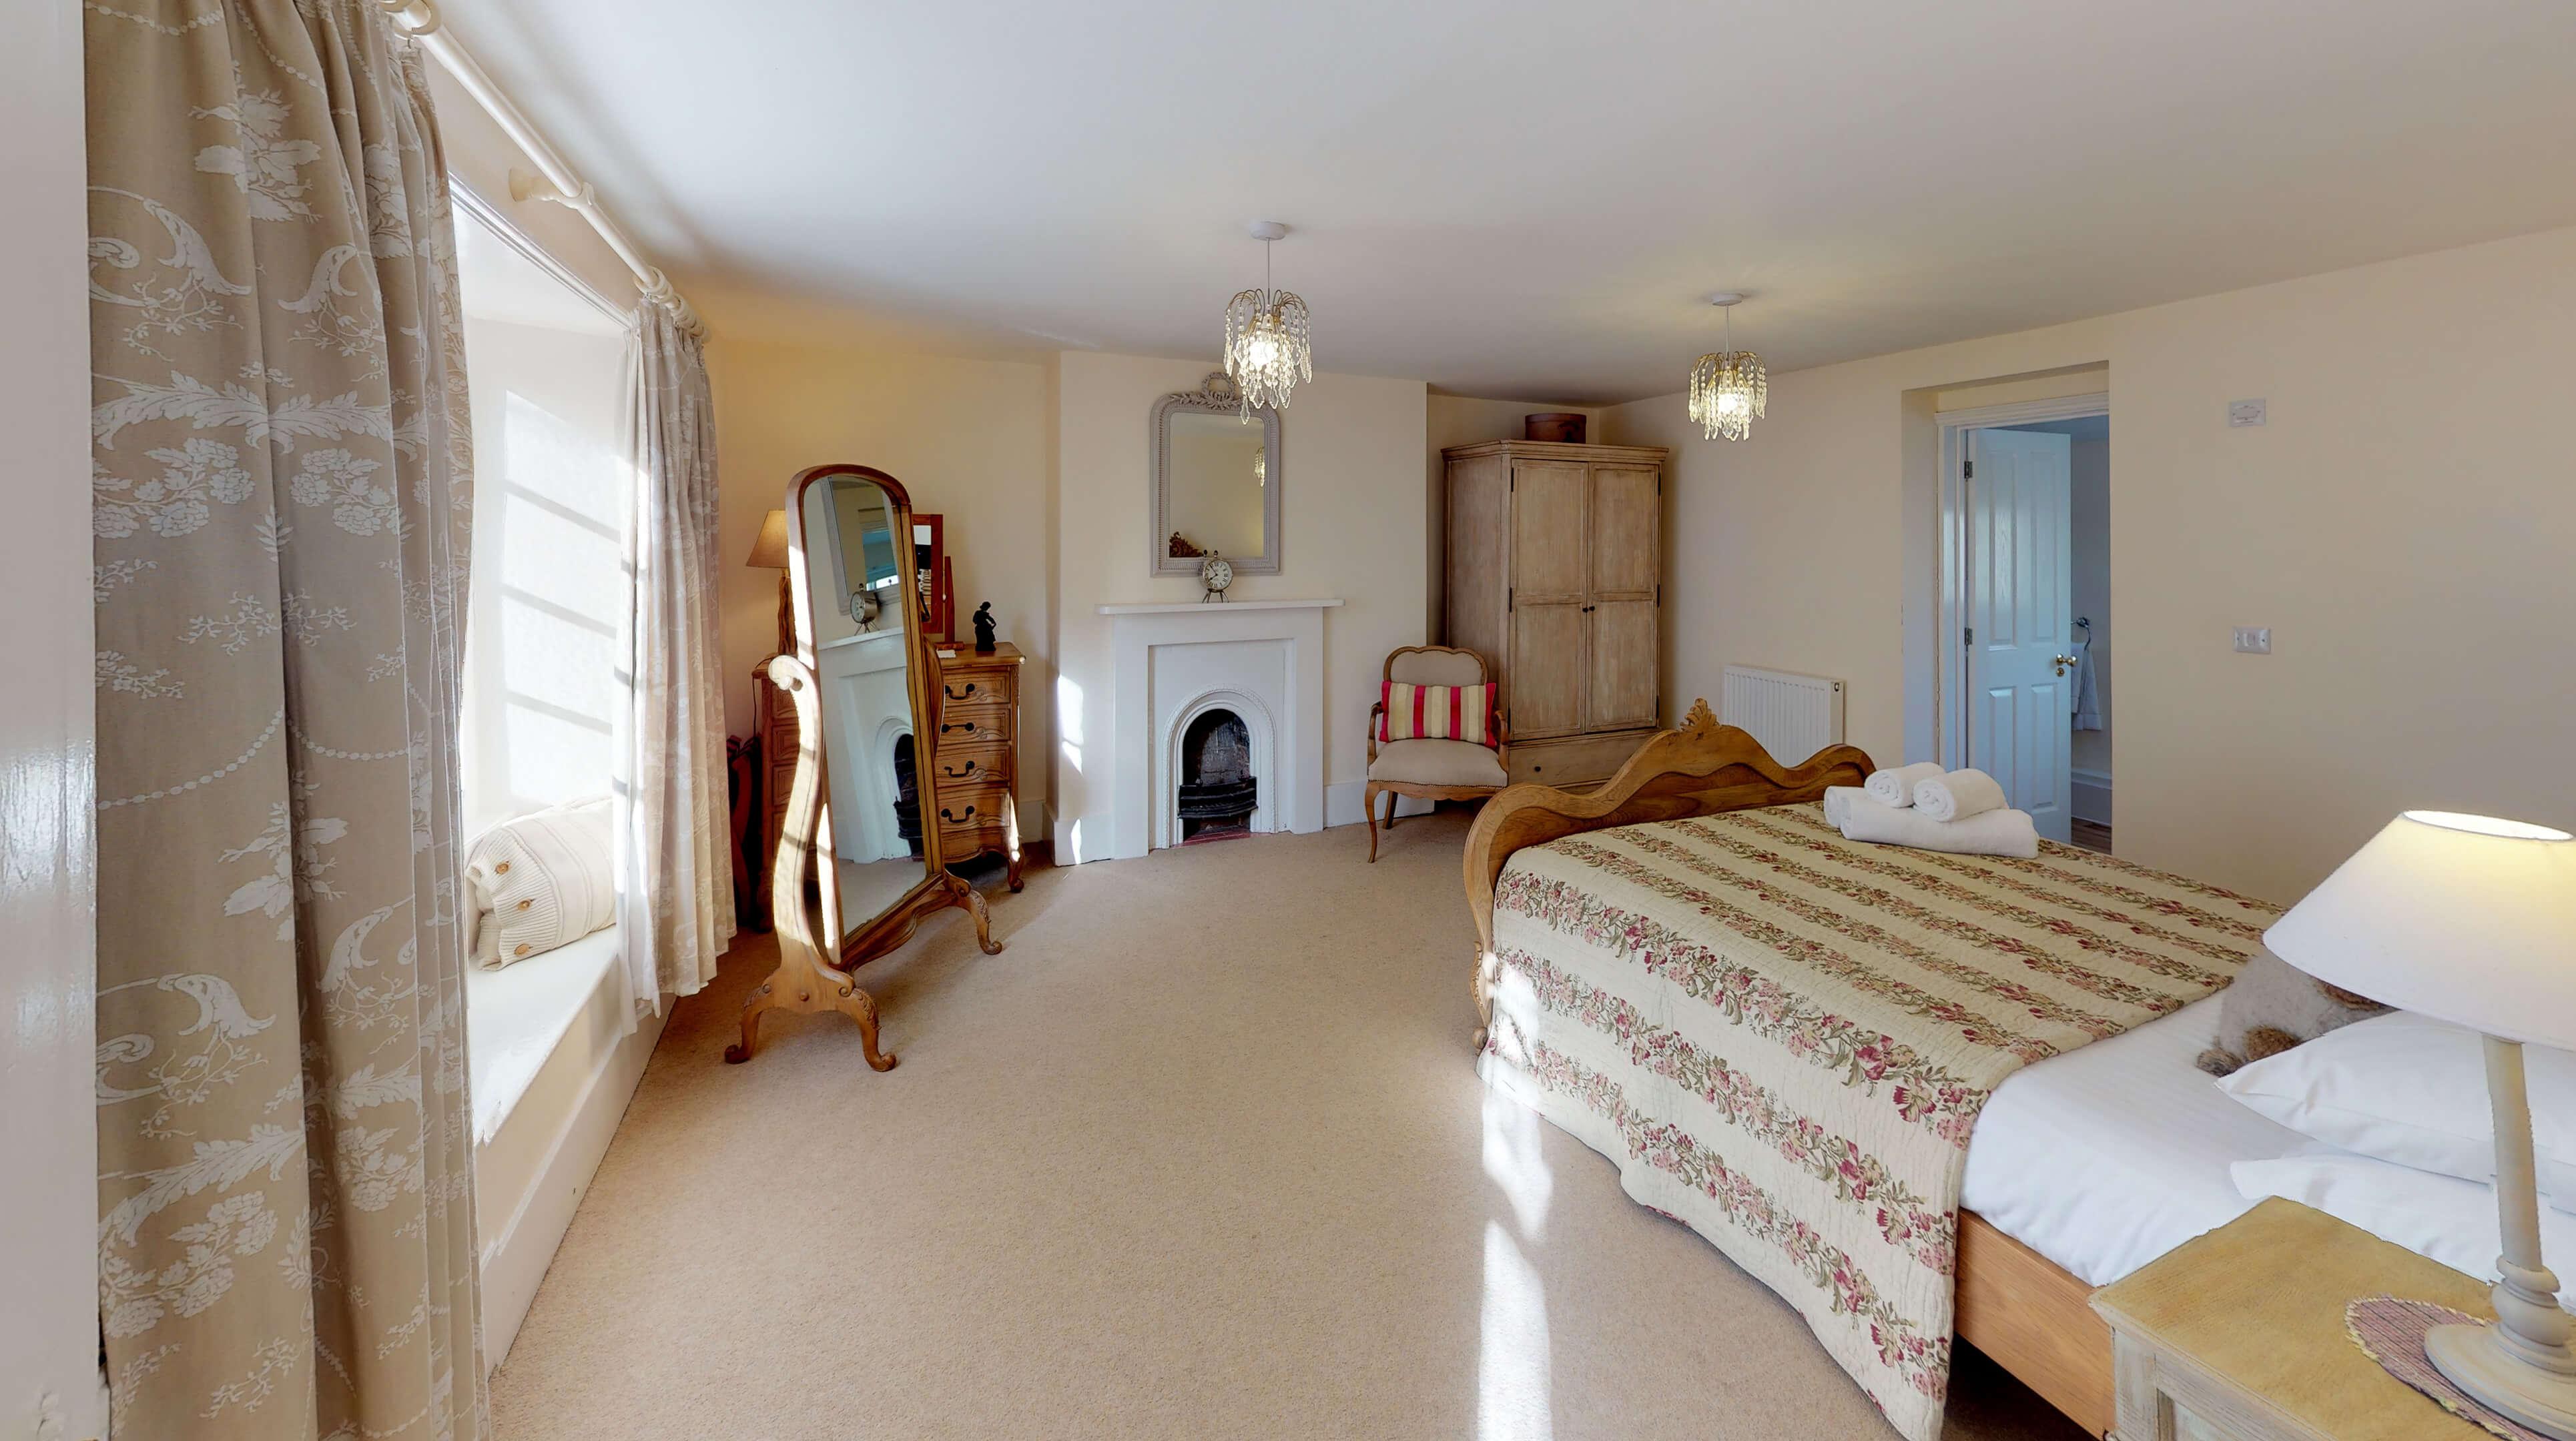 Bladon Two Bedroom Home Farm Cottage Bedroom One 2